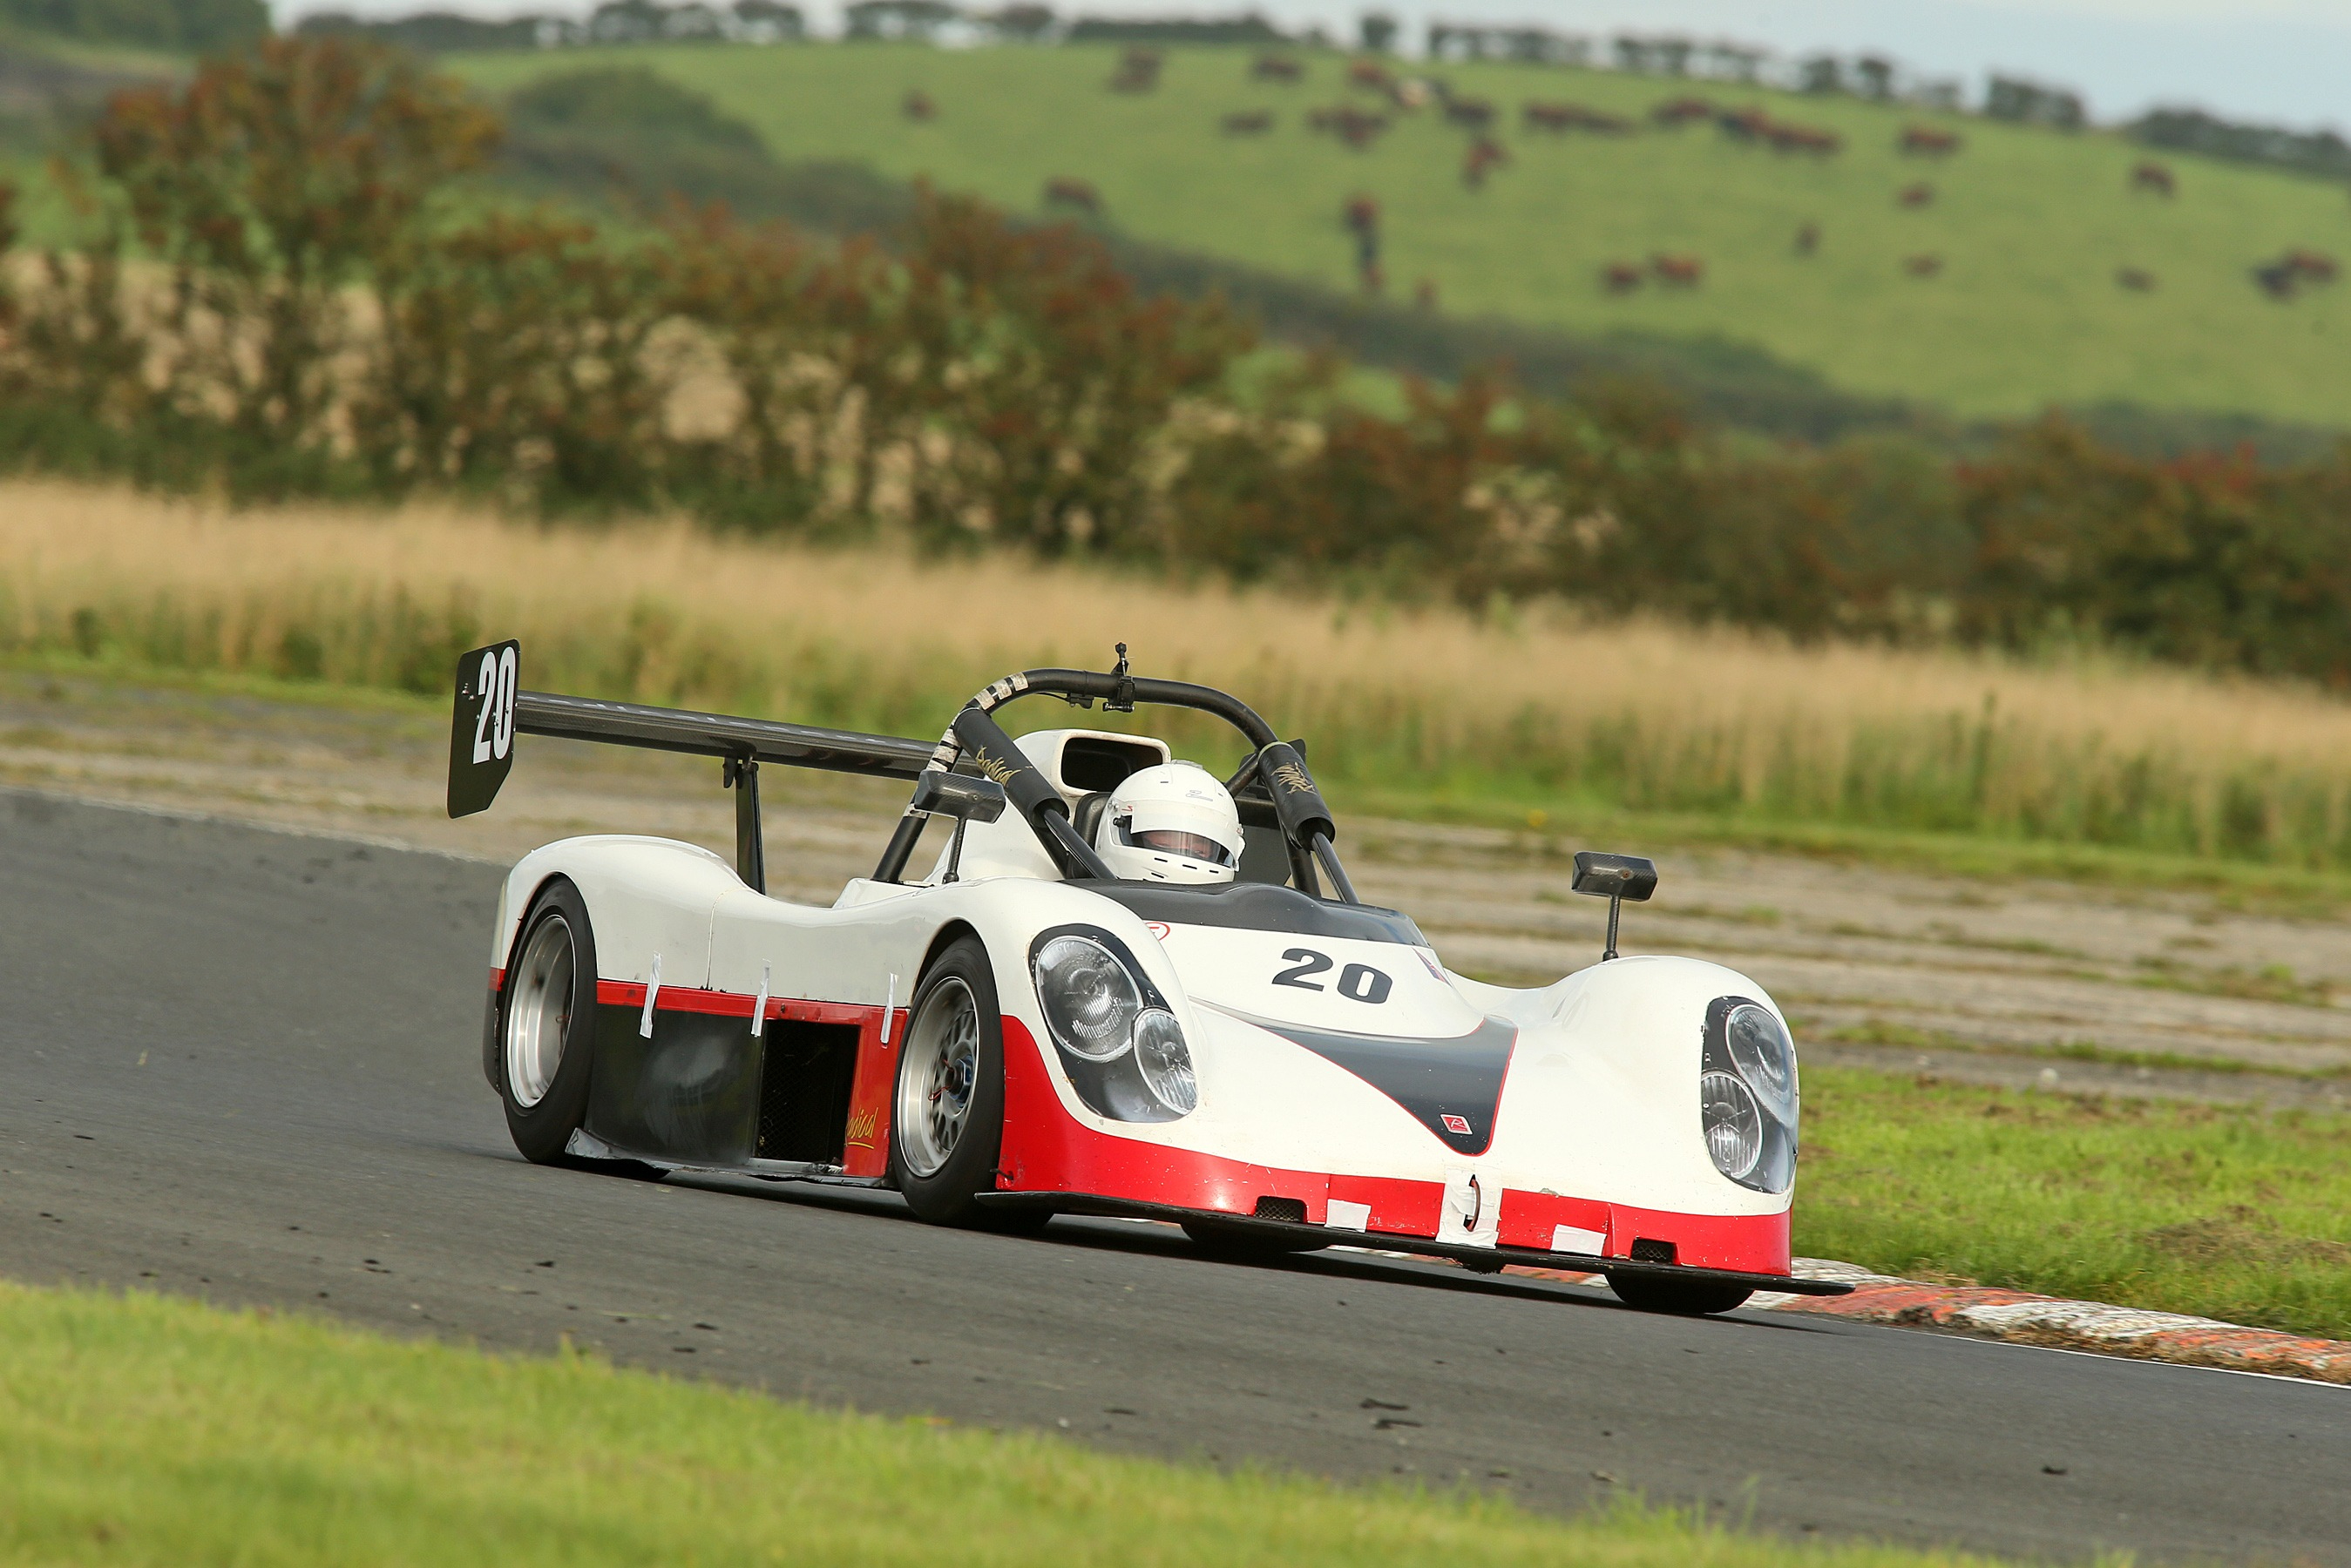 Roadsports race winner Jim Larkham